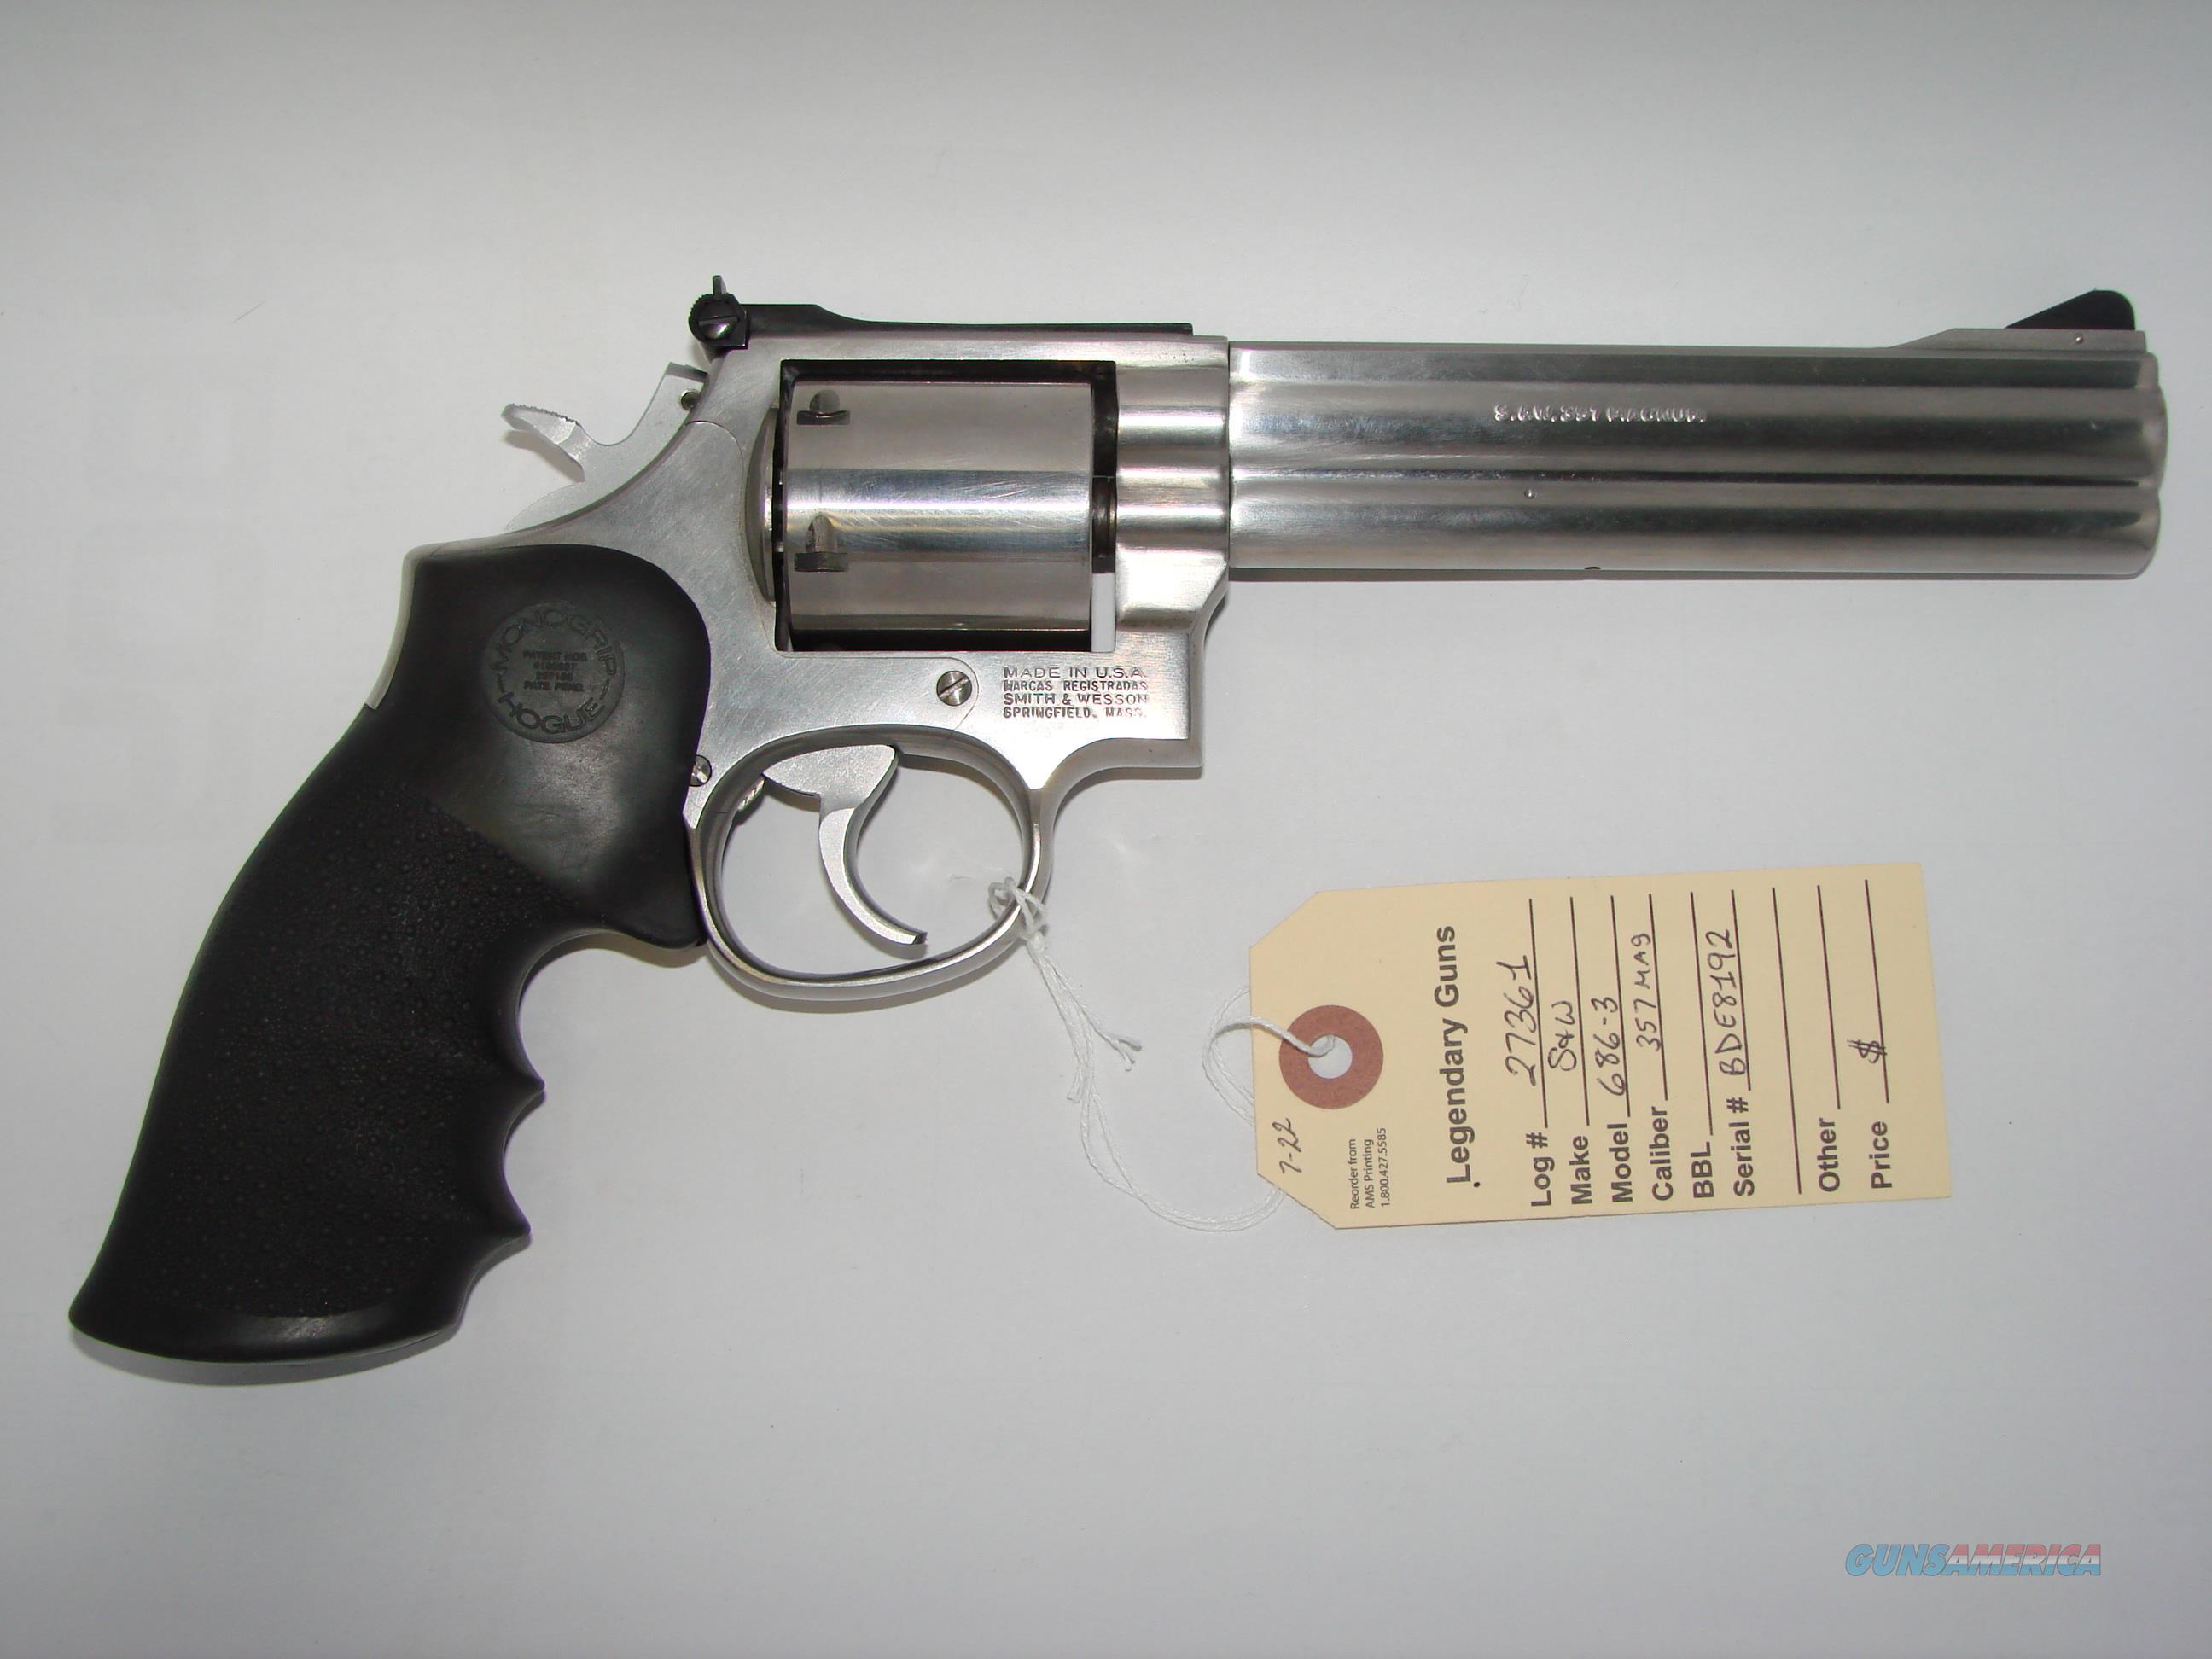 SW 686 3 W Action Job Guns Pistols Smith Wesson Revolvers